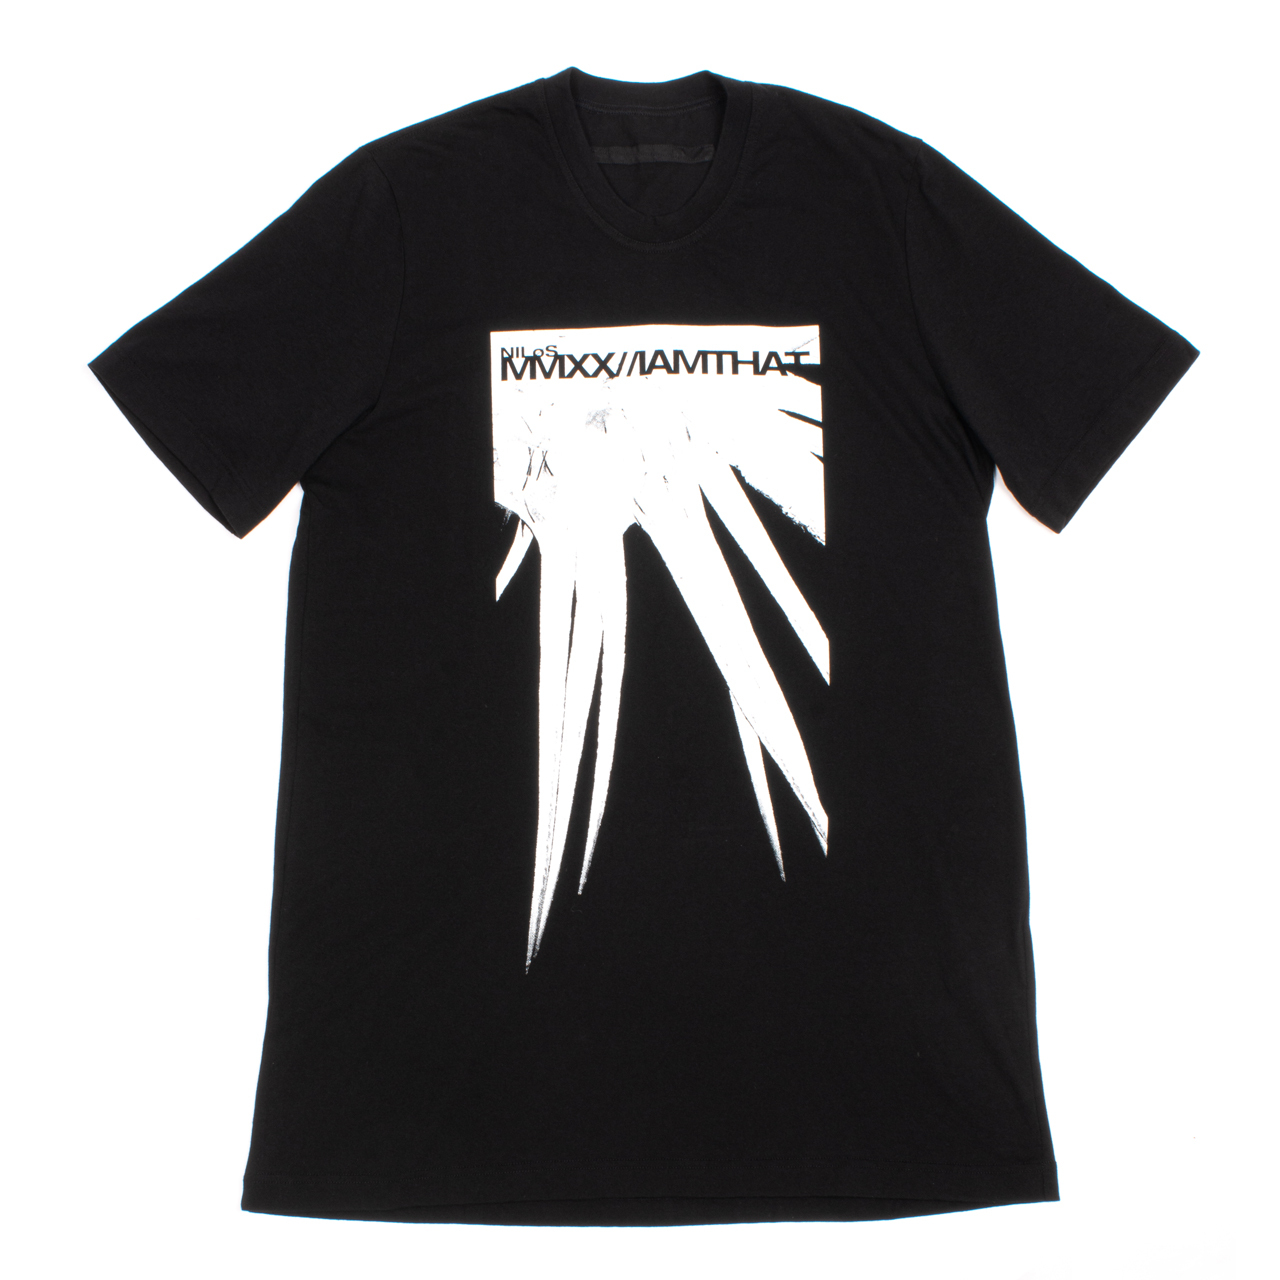 720CPM8-BLACK / スパイク プリント Tシャツ